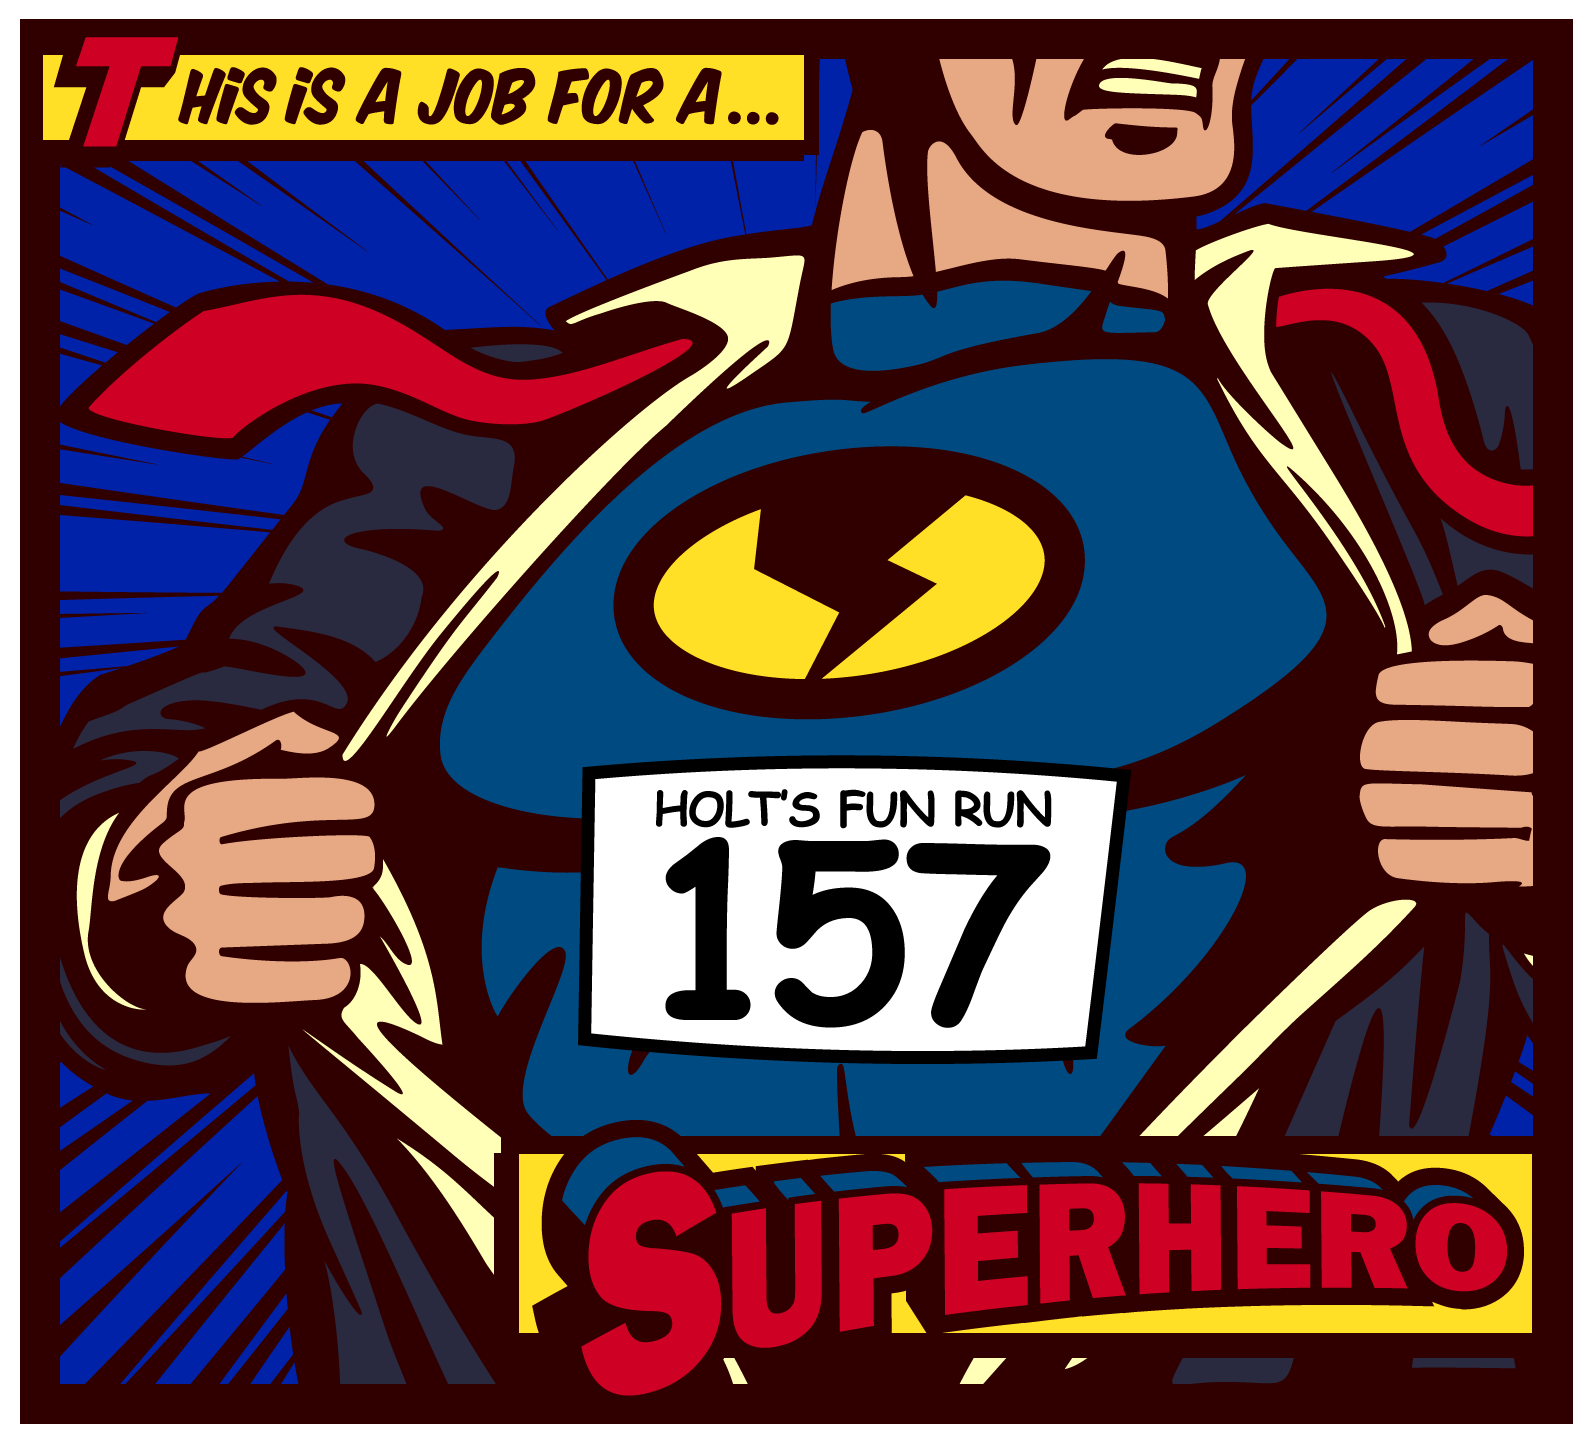 Holt's Super Hero Fun Run